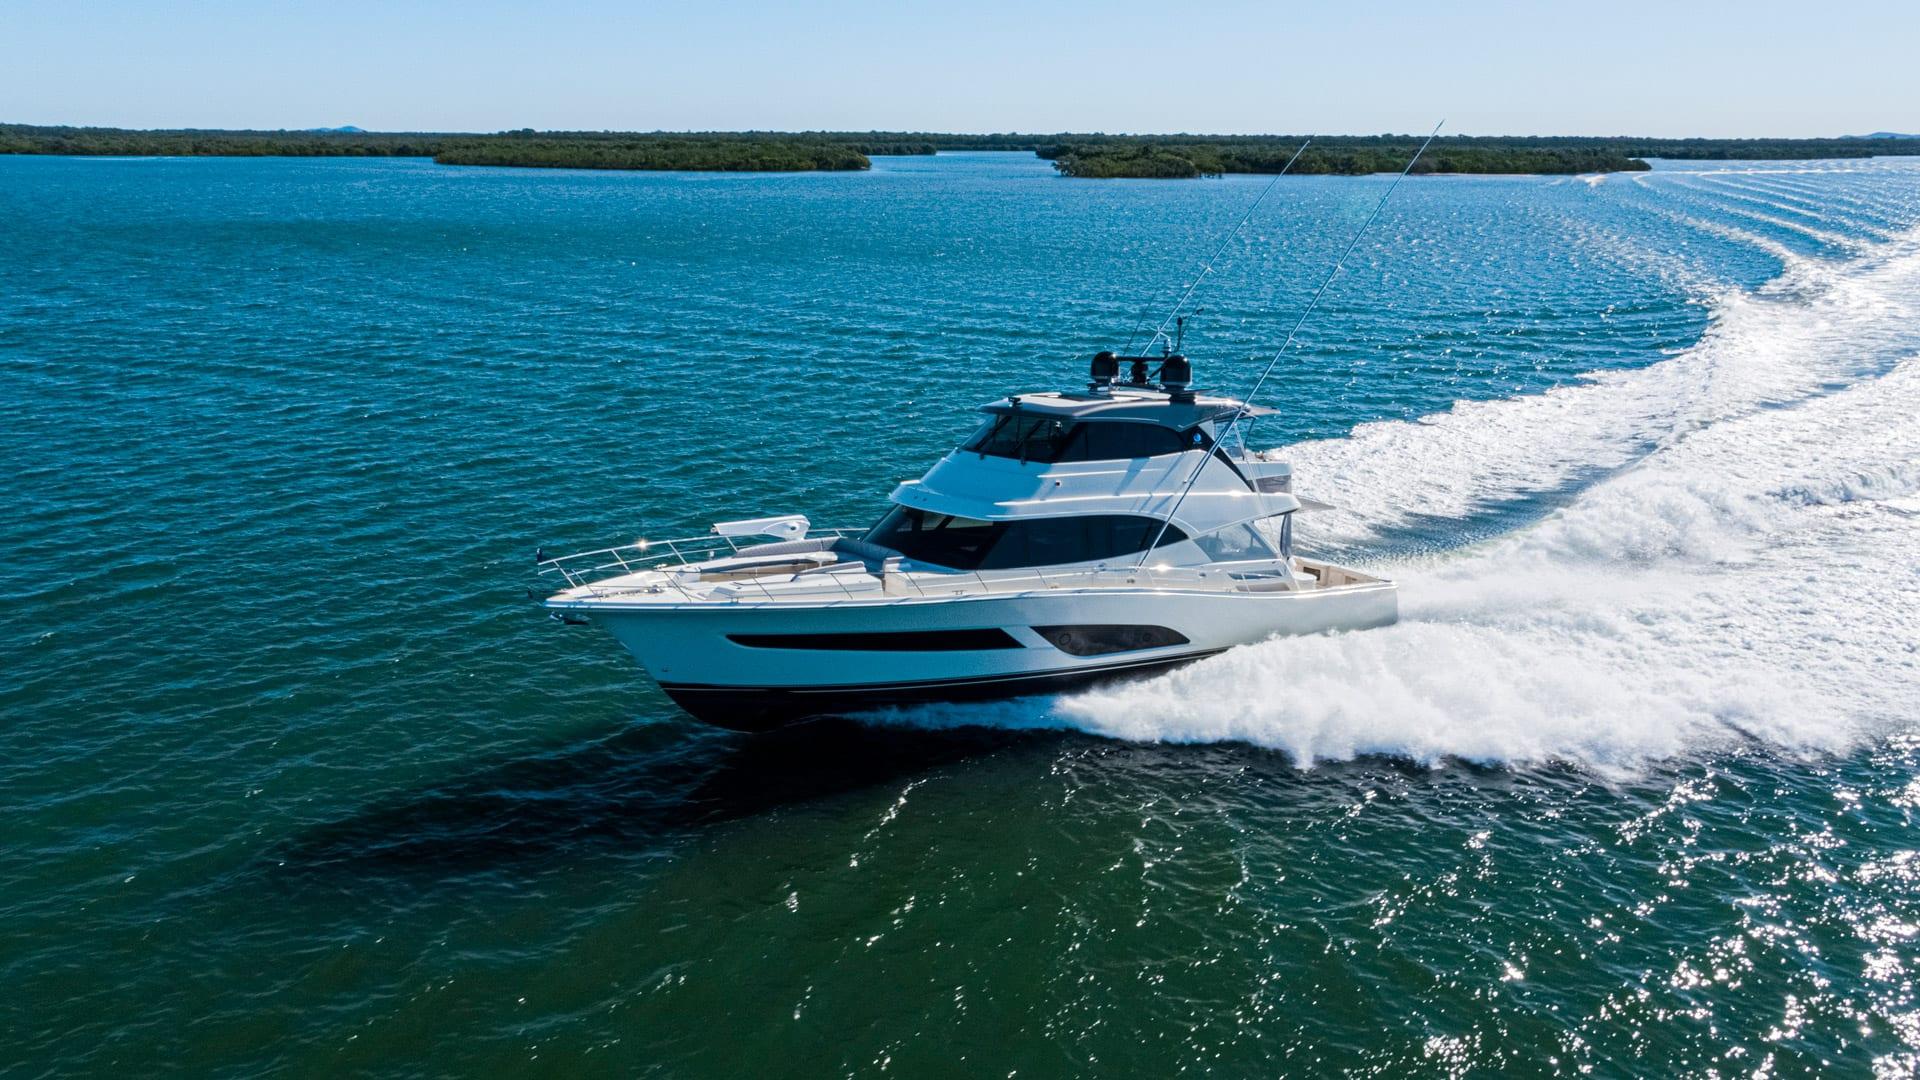 Riviera-64-Sports-Motor-Yacht-Running-011